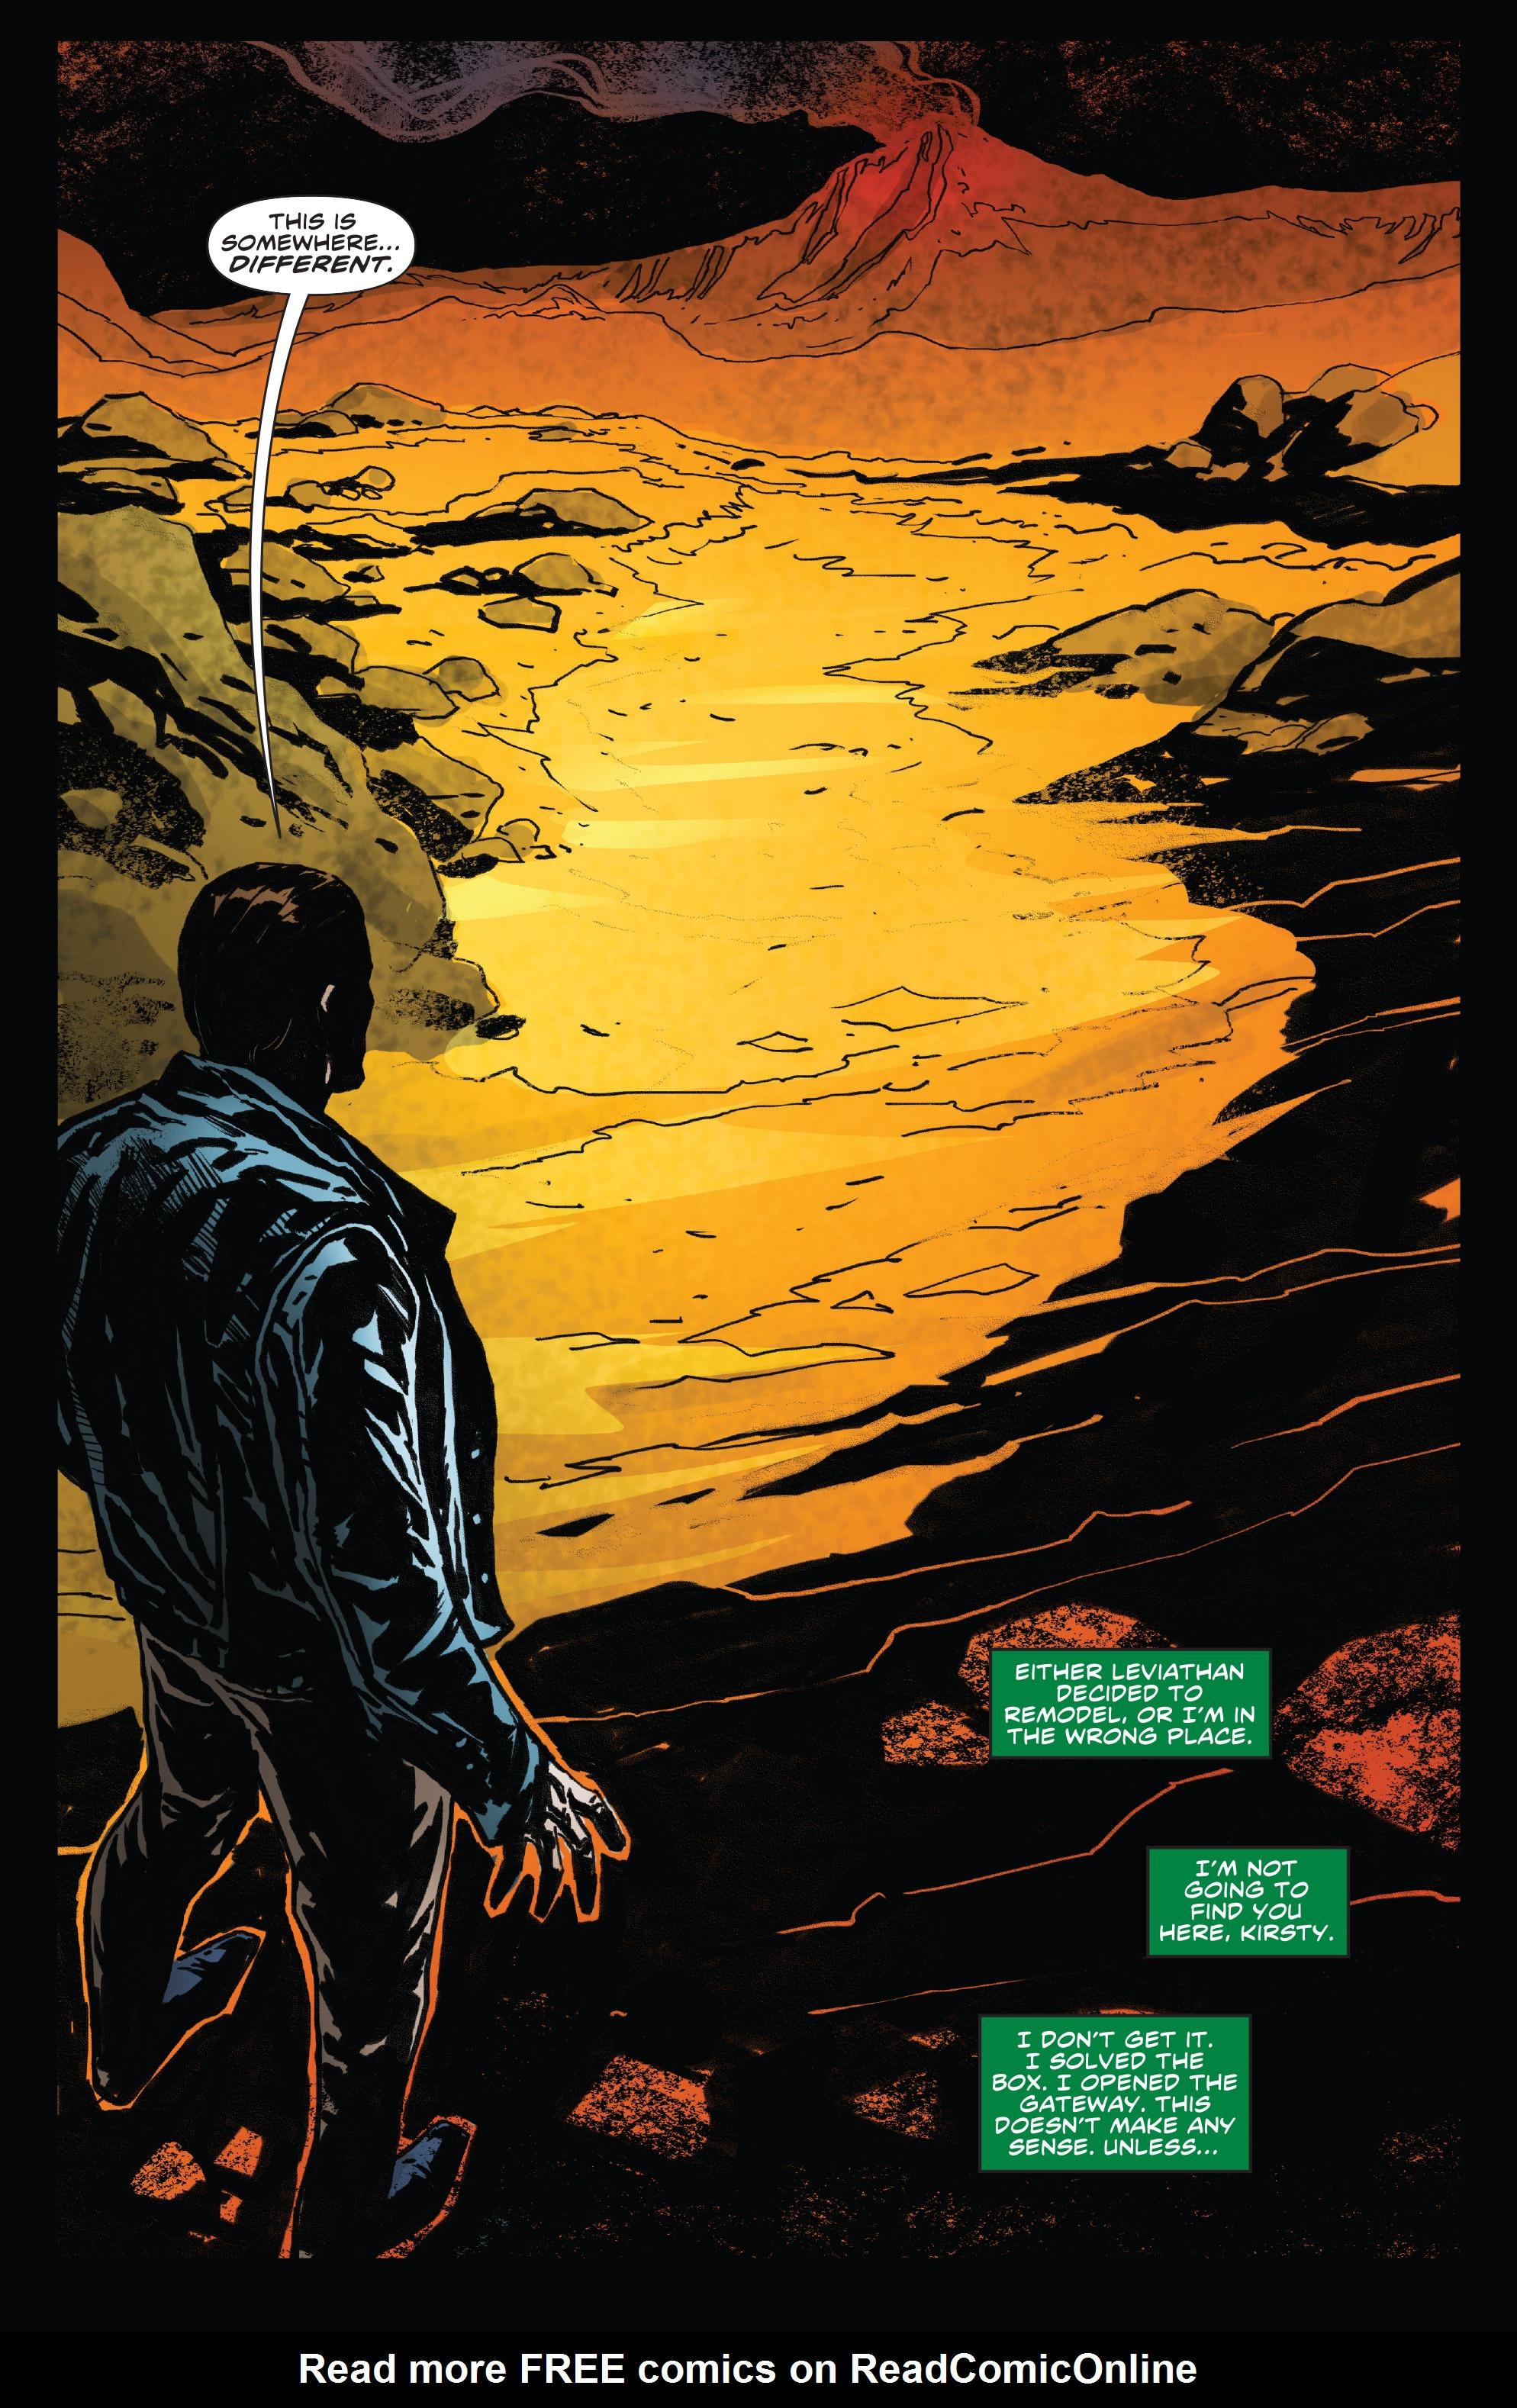 Read online Clive Barker's Hellraiser: The Dark Watch comic -  Issue # TPB 3 - 24